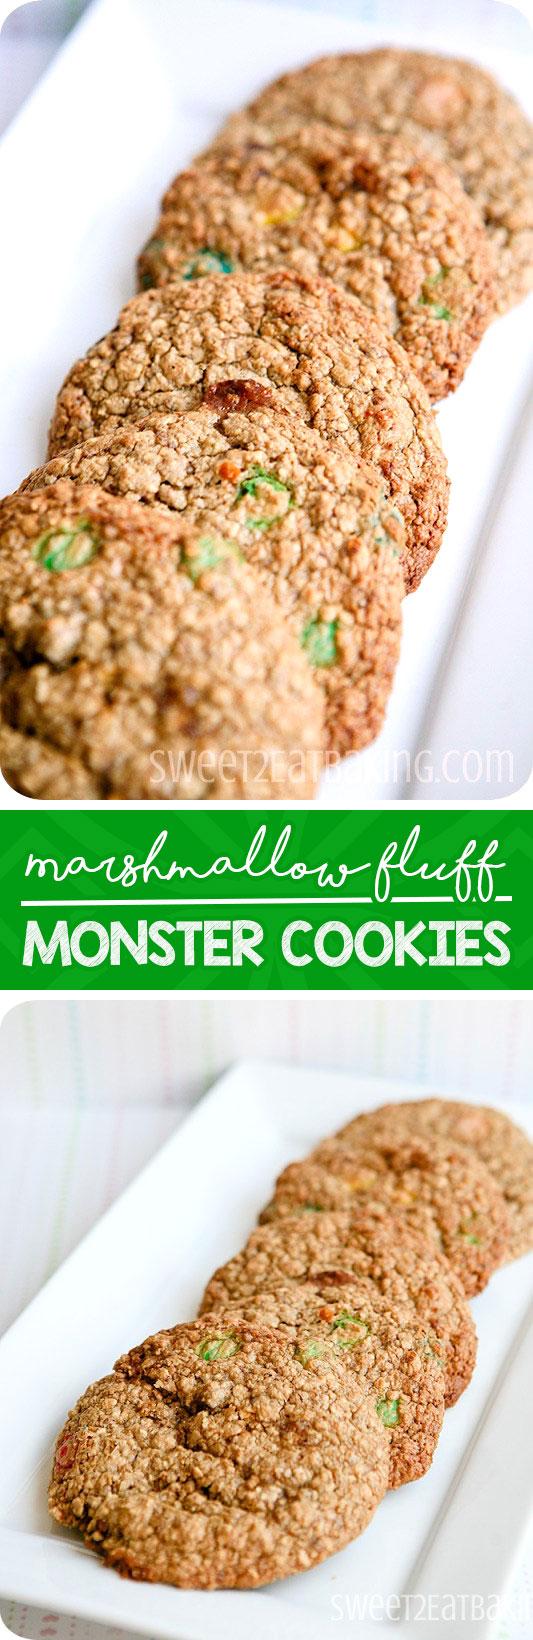 marshmallow-fluff-monster-cookies